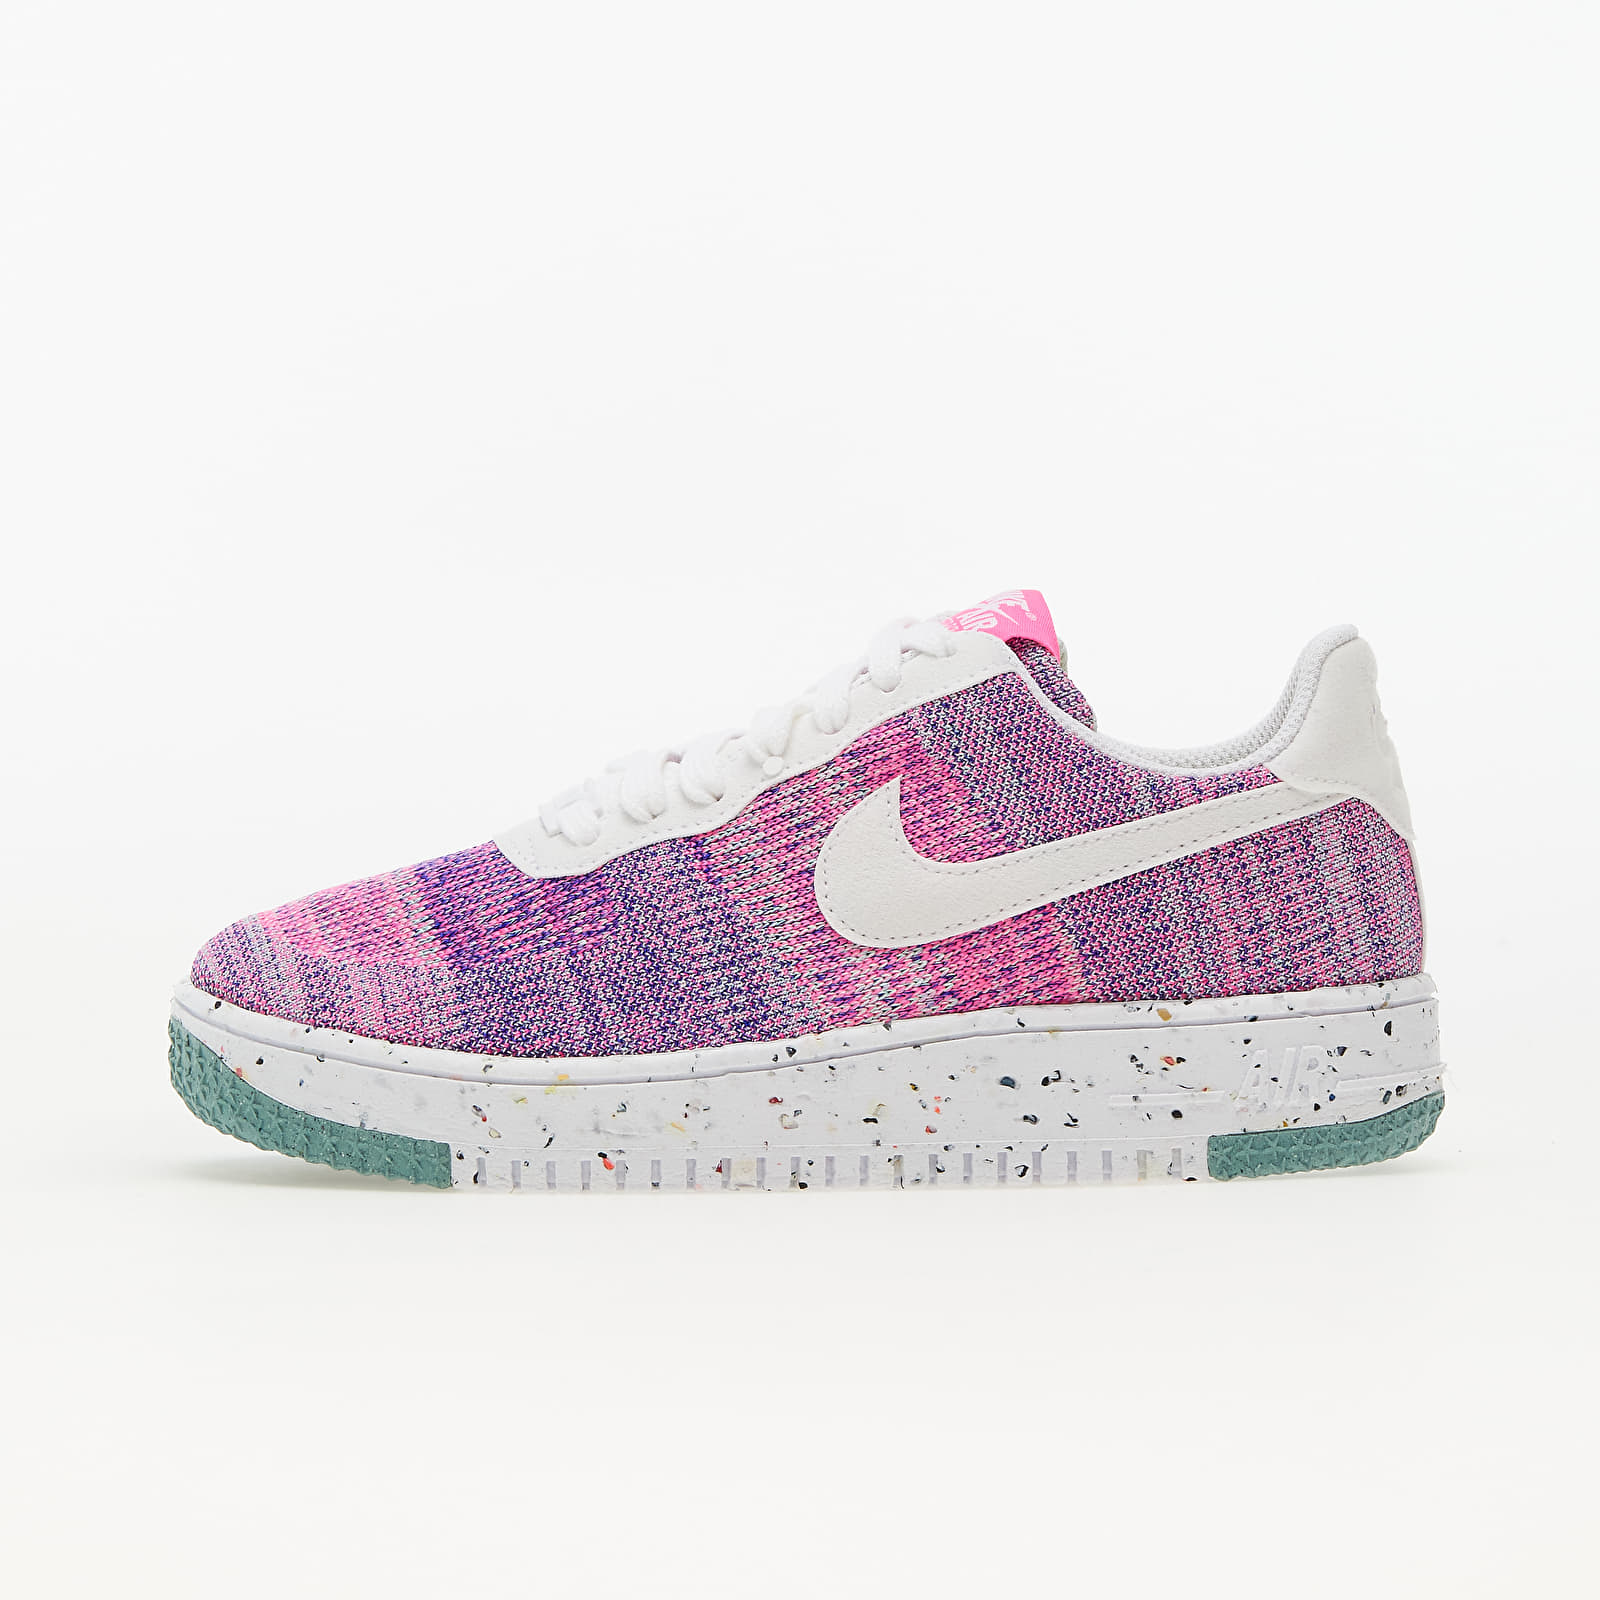 Nike Air Force 1 Crater Flyknit Fuschia Glow/ White - Pink Blast EUR 43